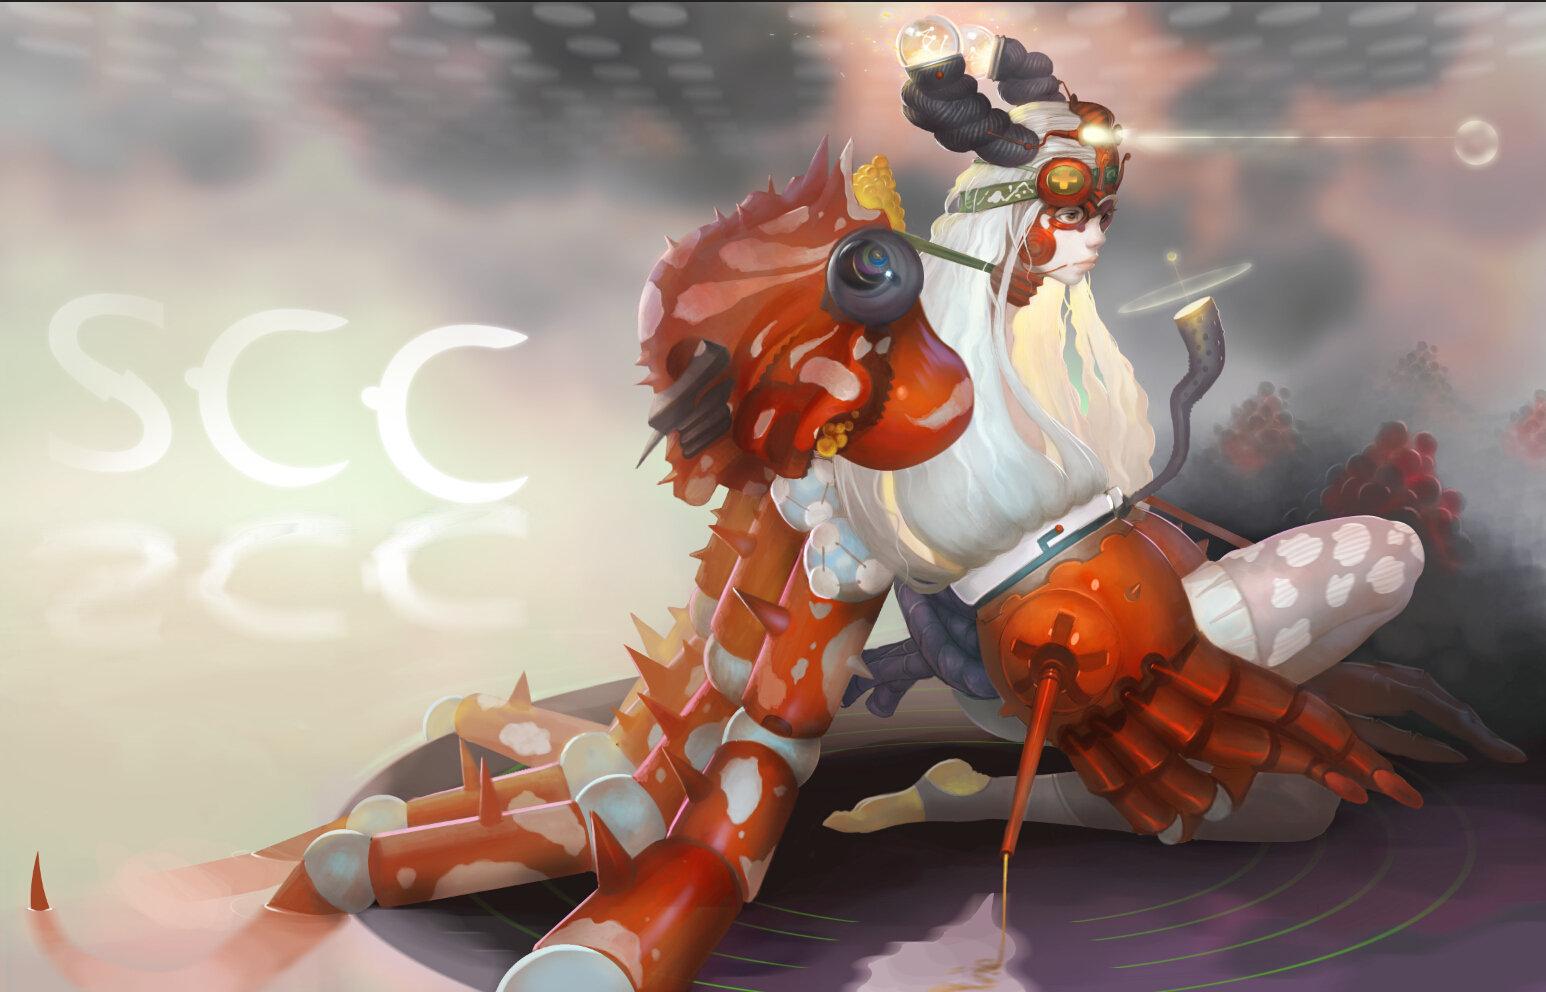 crabgirl of scc